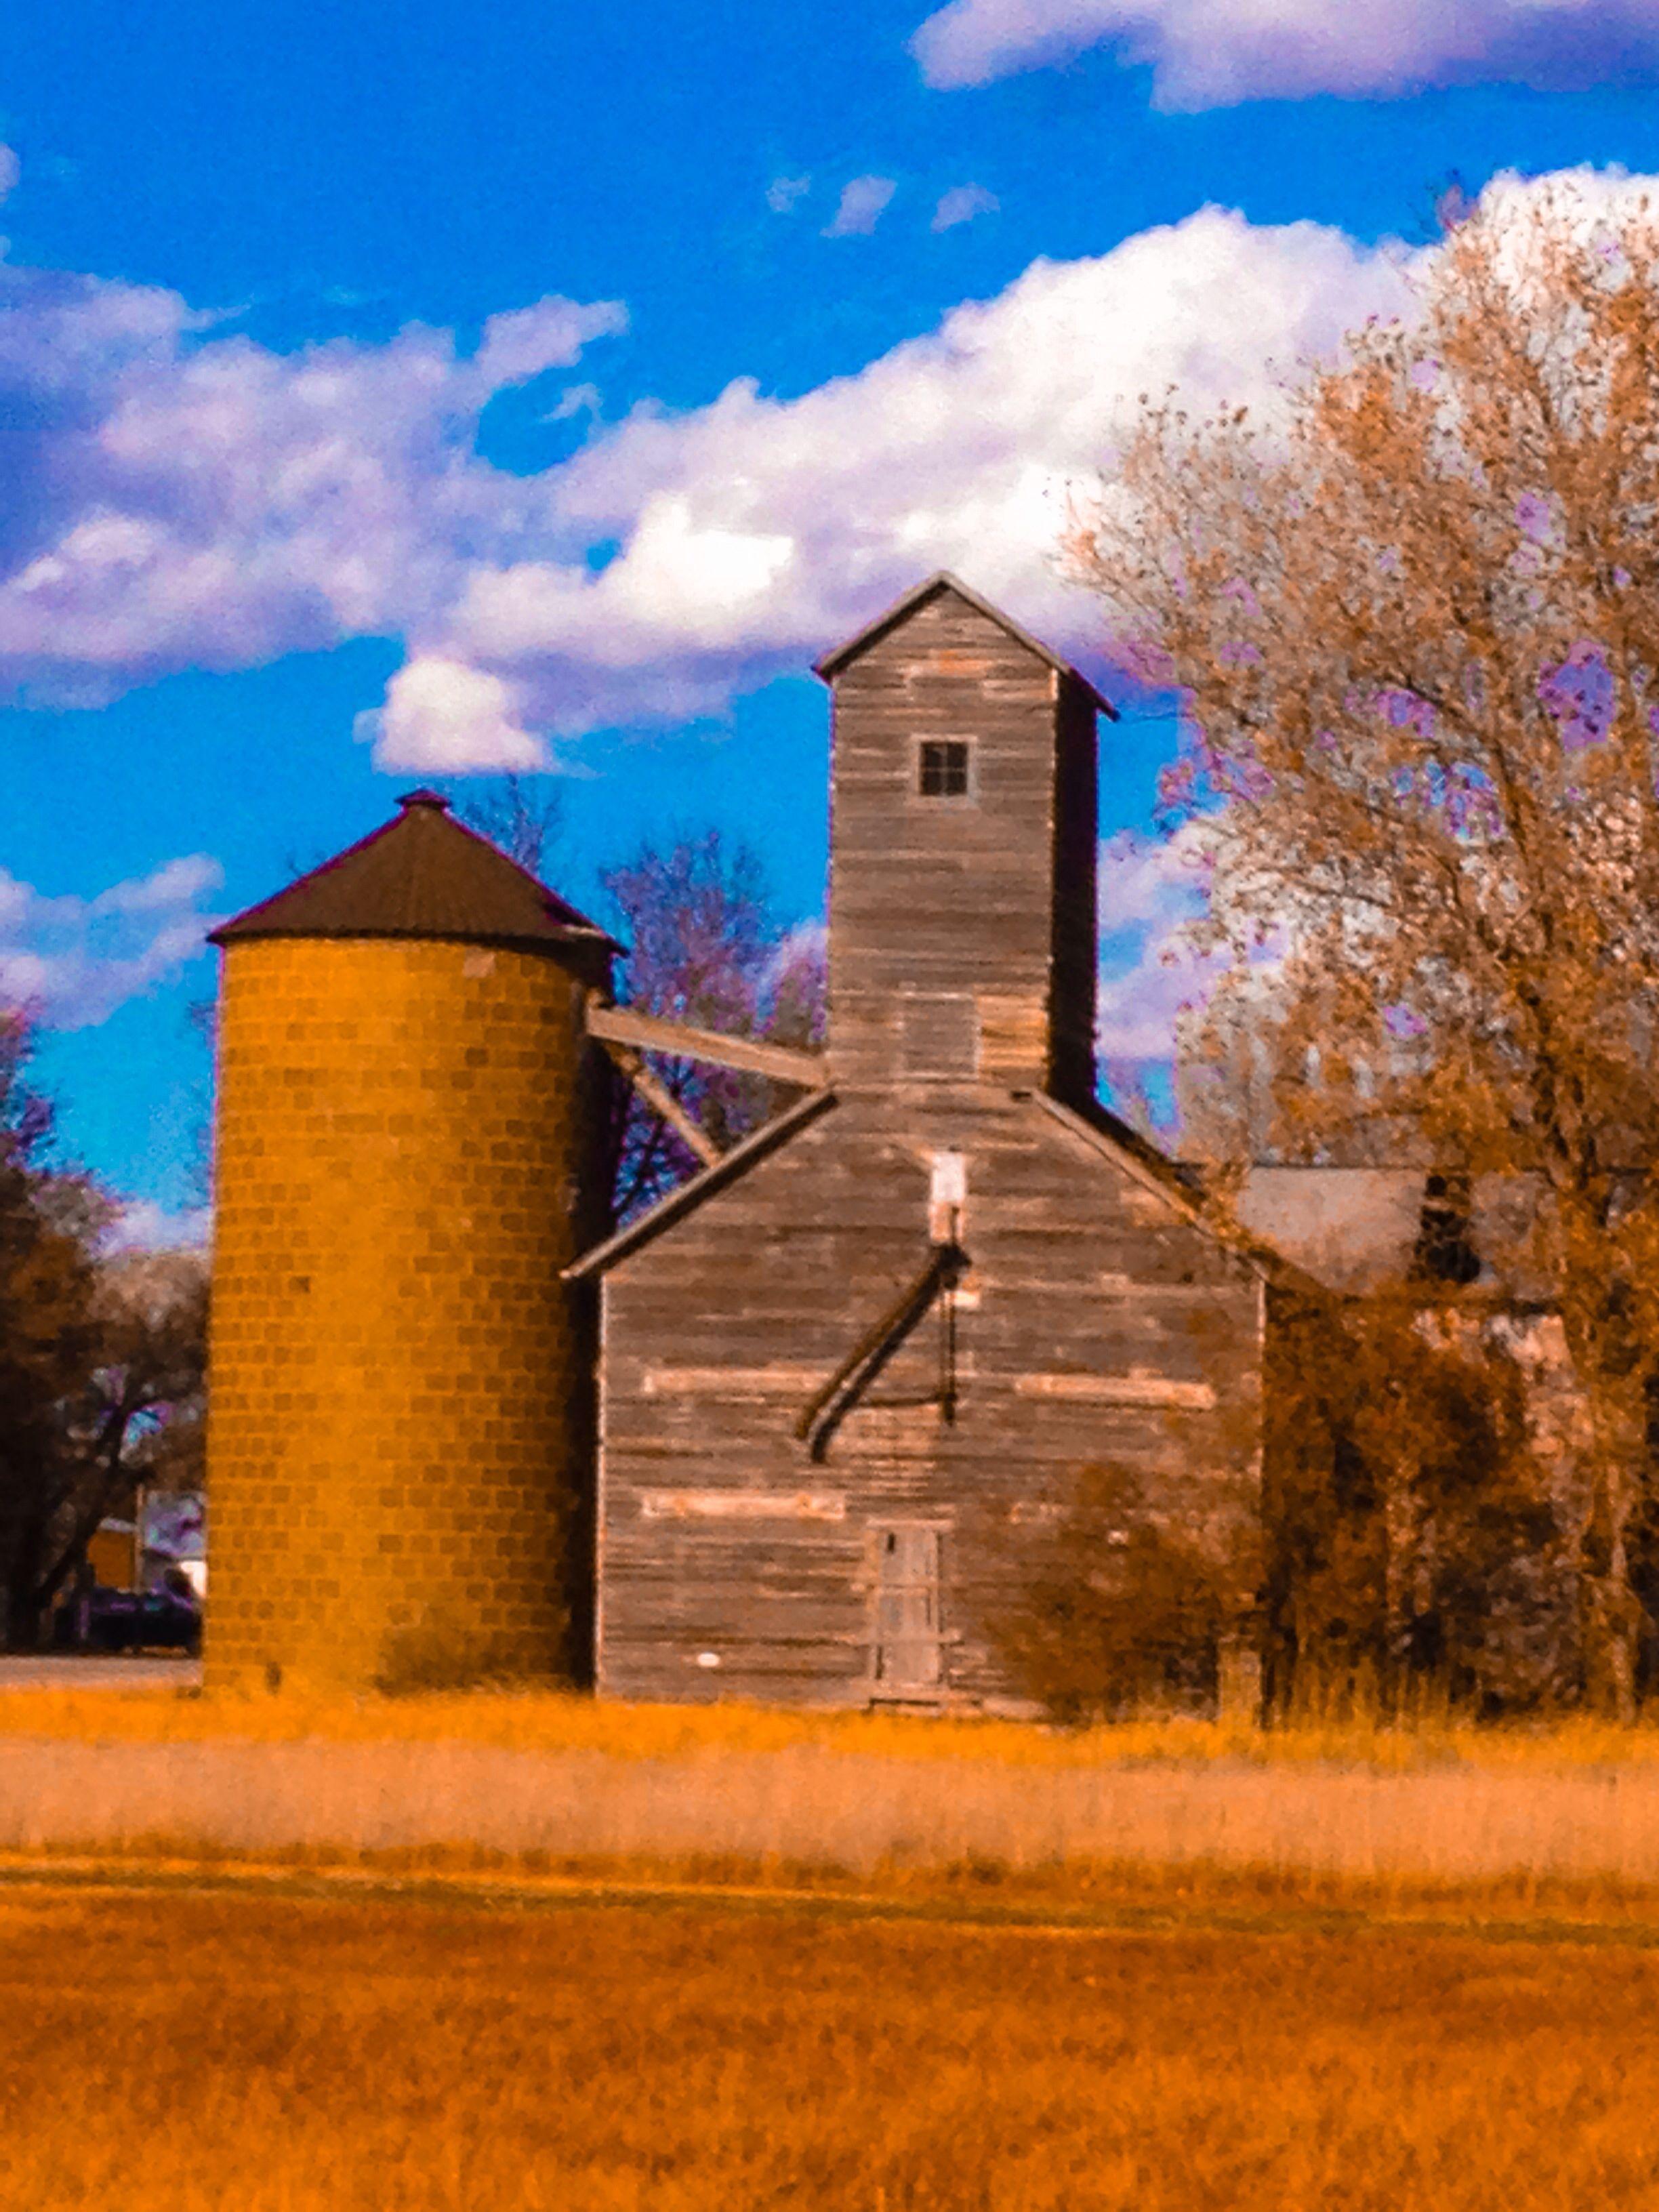 Kansas stanton county manter - Lost Springs Kansas A Ghost Town